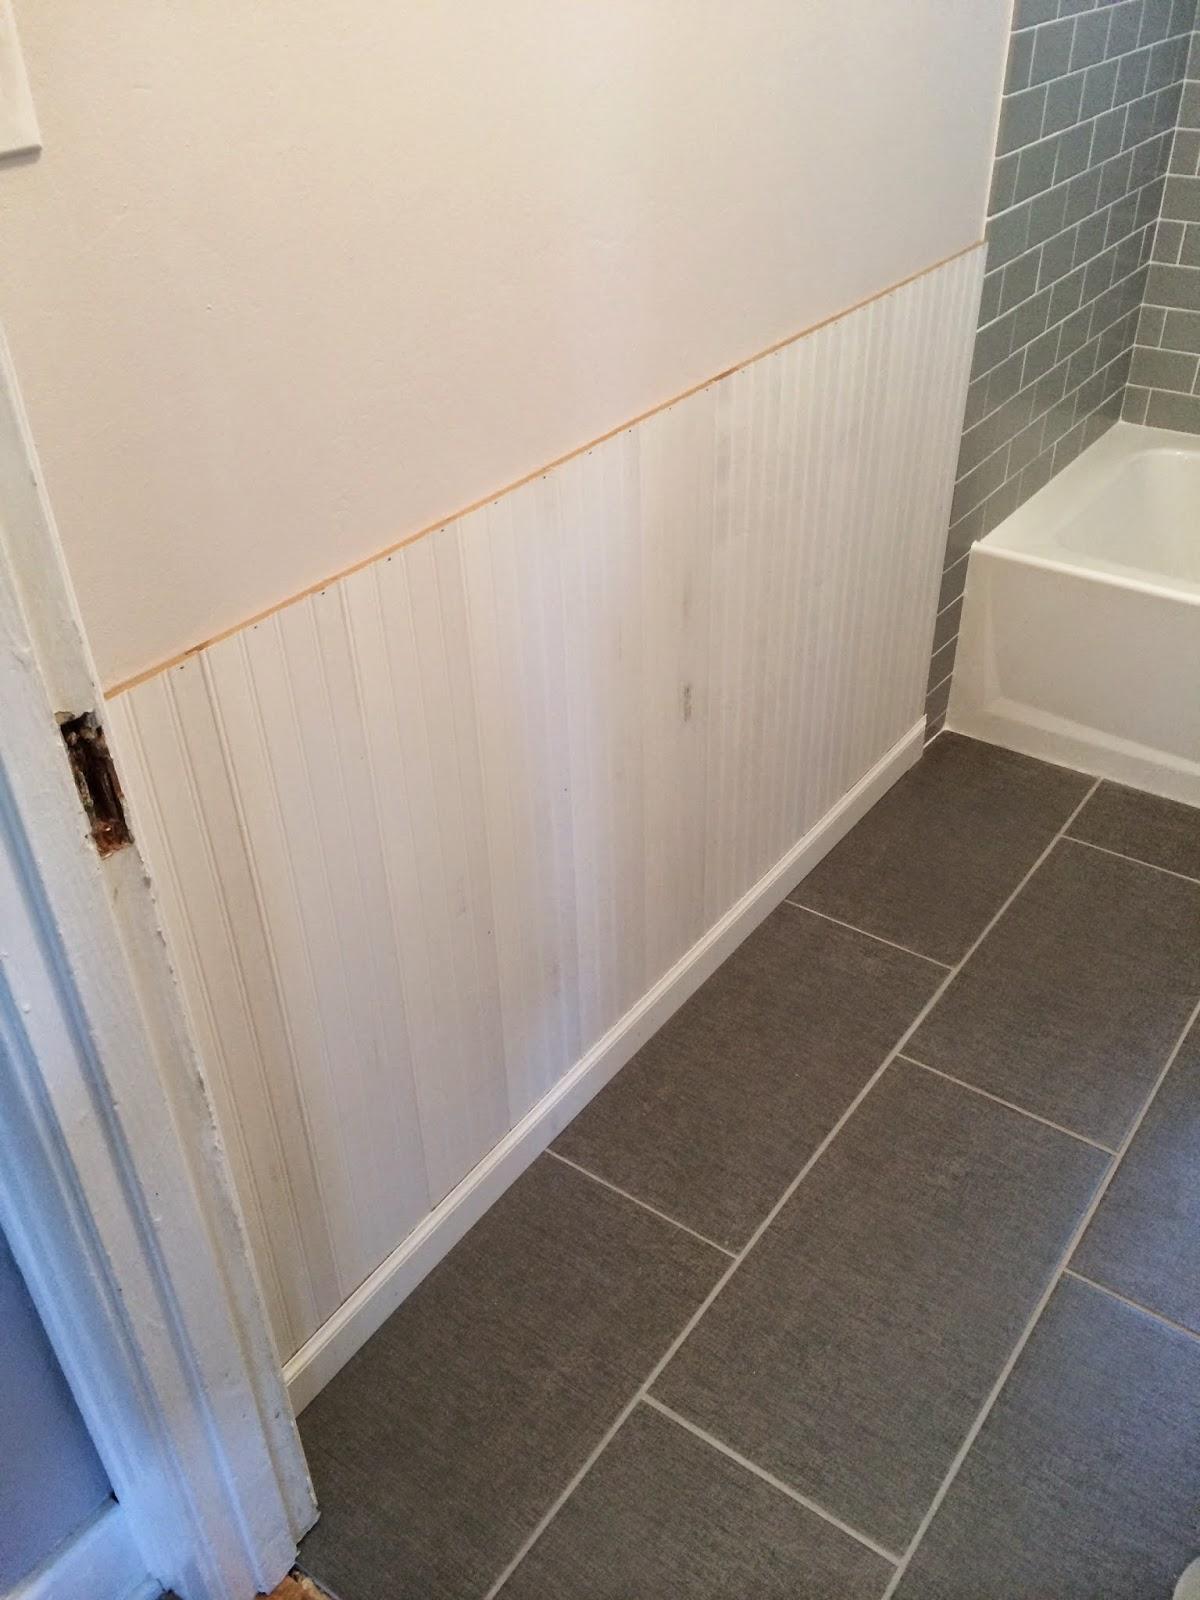 My DIY House Wainscoting Bathroom Diy on diy shelving bathroom, diy ceilings bathroom, diy wood bathroom, diy mirrors bathroom, diy vanity bathroom, diy countertops bathroom, diy bathroom remodels, diy basement bathroom, diy bathroom backsplash, diy cabinets bathroom, diy bathroom paneling, diy loft bathroom, diy plywood bathroom, diy paint bathroom, diy master bathroom ideas, diy painting bathroom, diy projects bathrooms, diy bathroom tile, diy bathroom accessories, diy bathroom design,